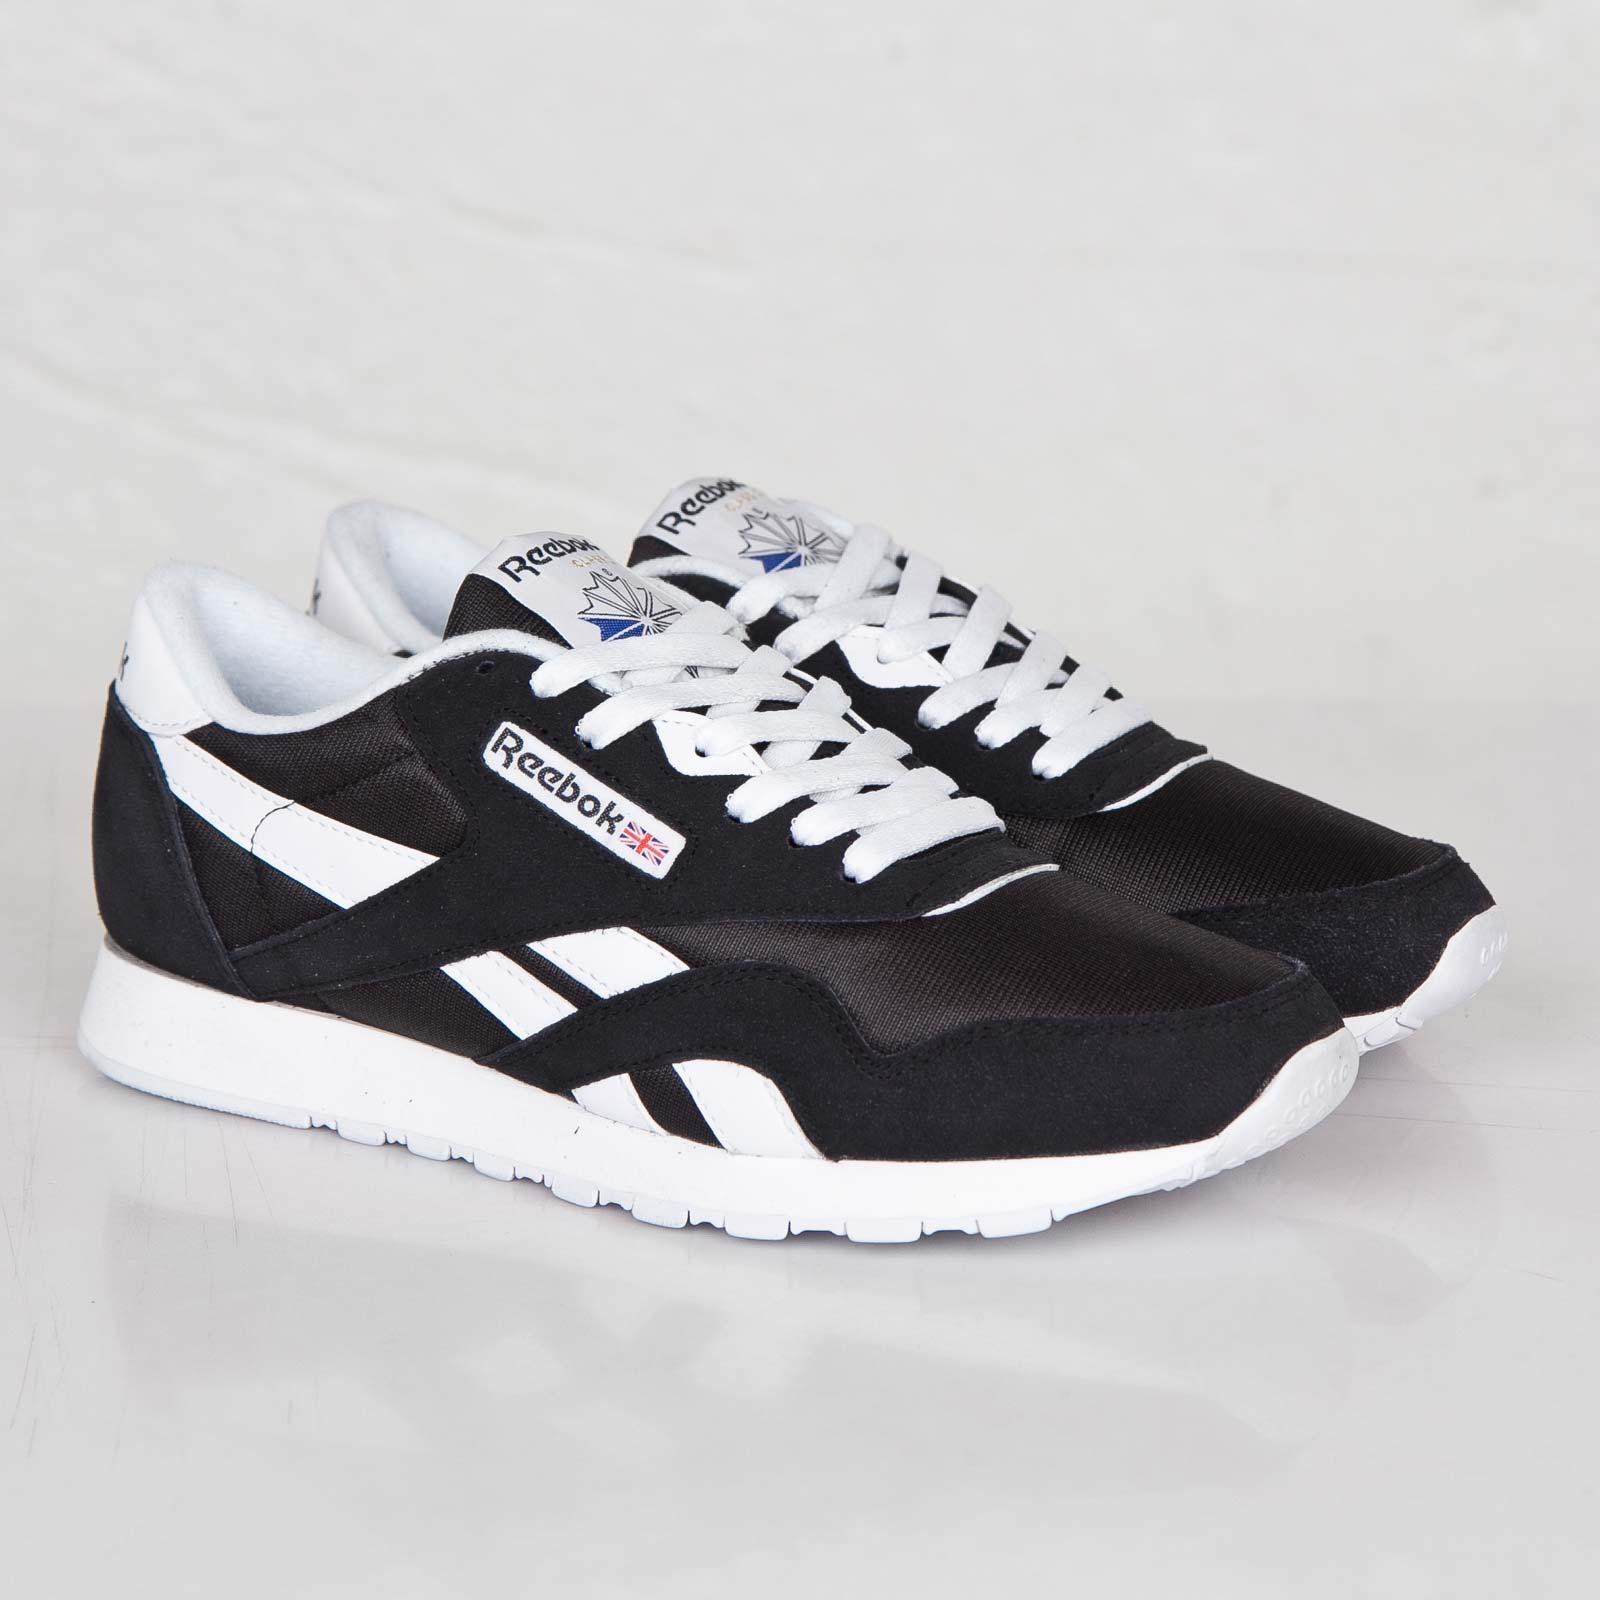 390a64c5cba Reebok Classic Nylon - 6604 - Sneakersnstuff